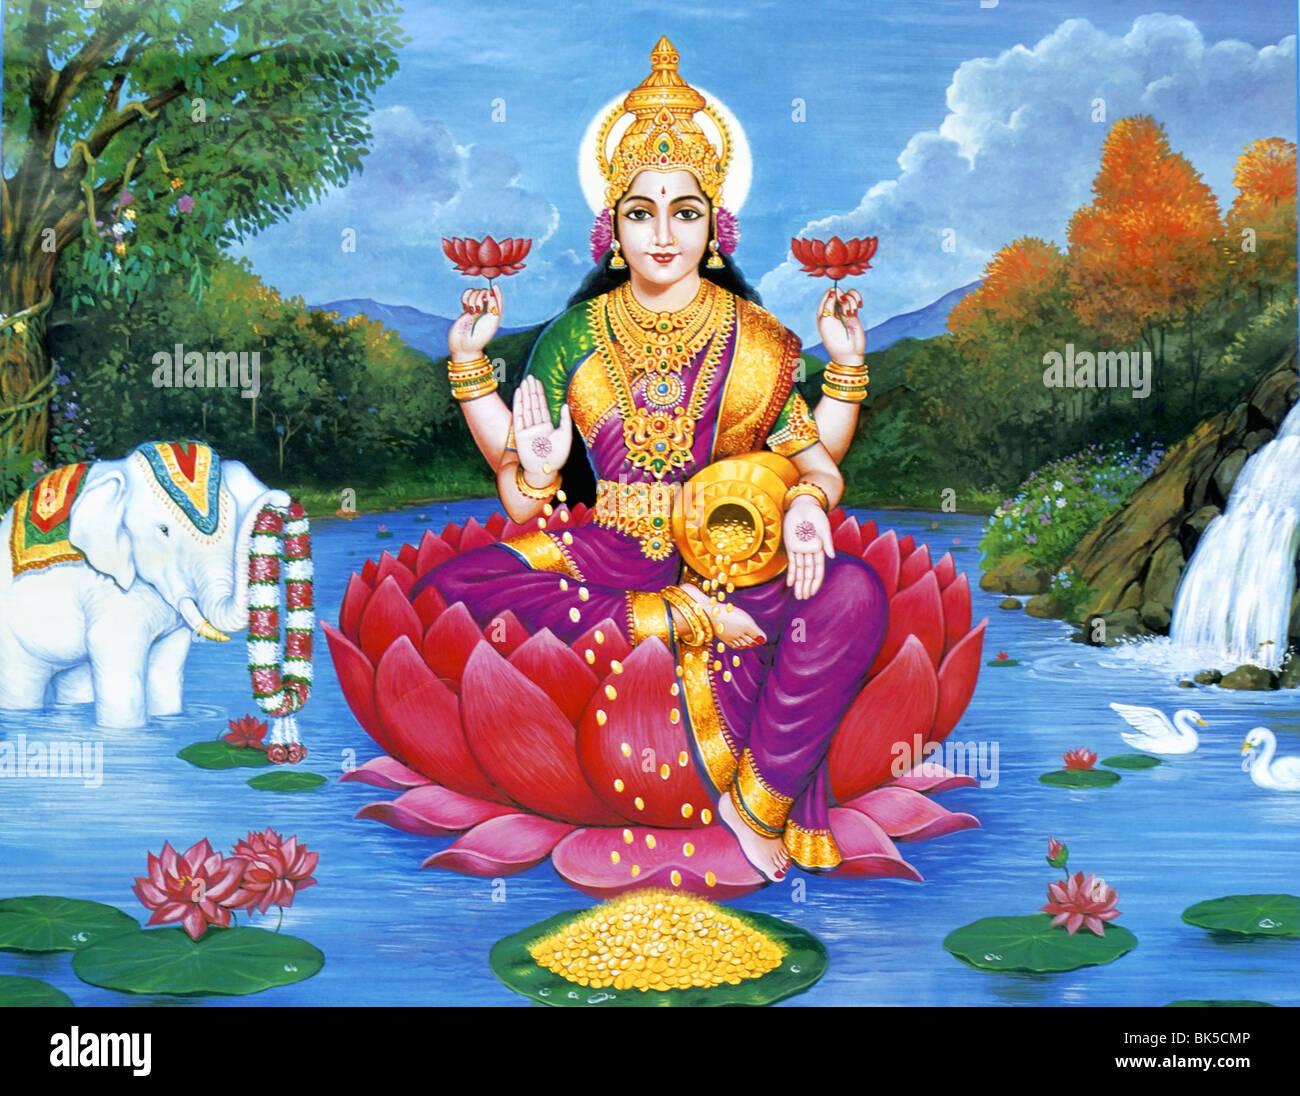 Goddess Lakshmi, Is The Hindu Goddess Of Wealth, Fortune